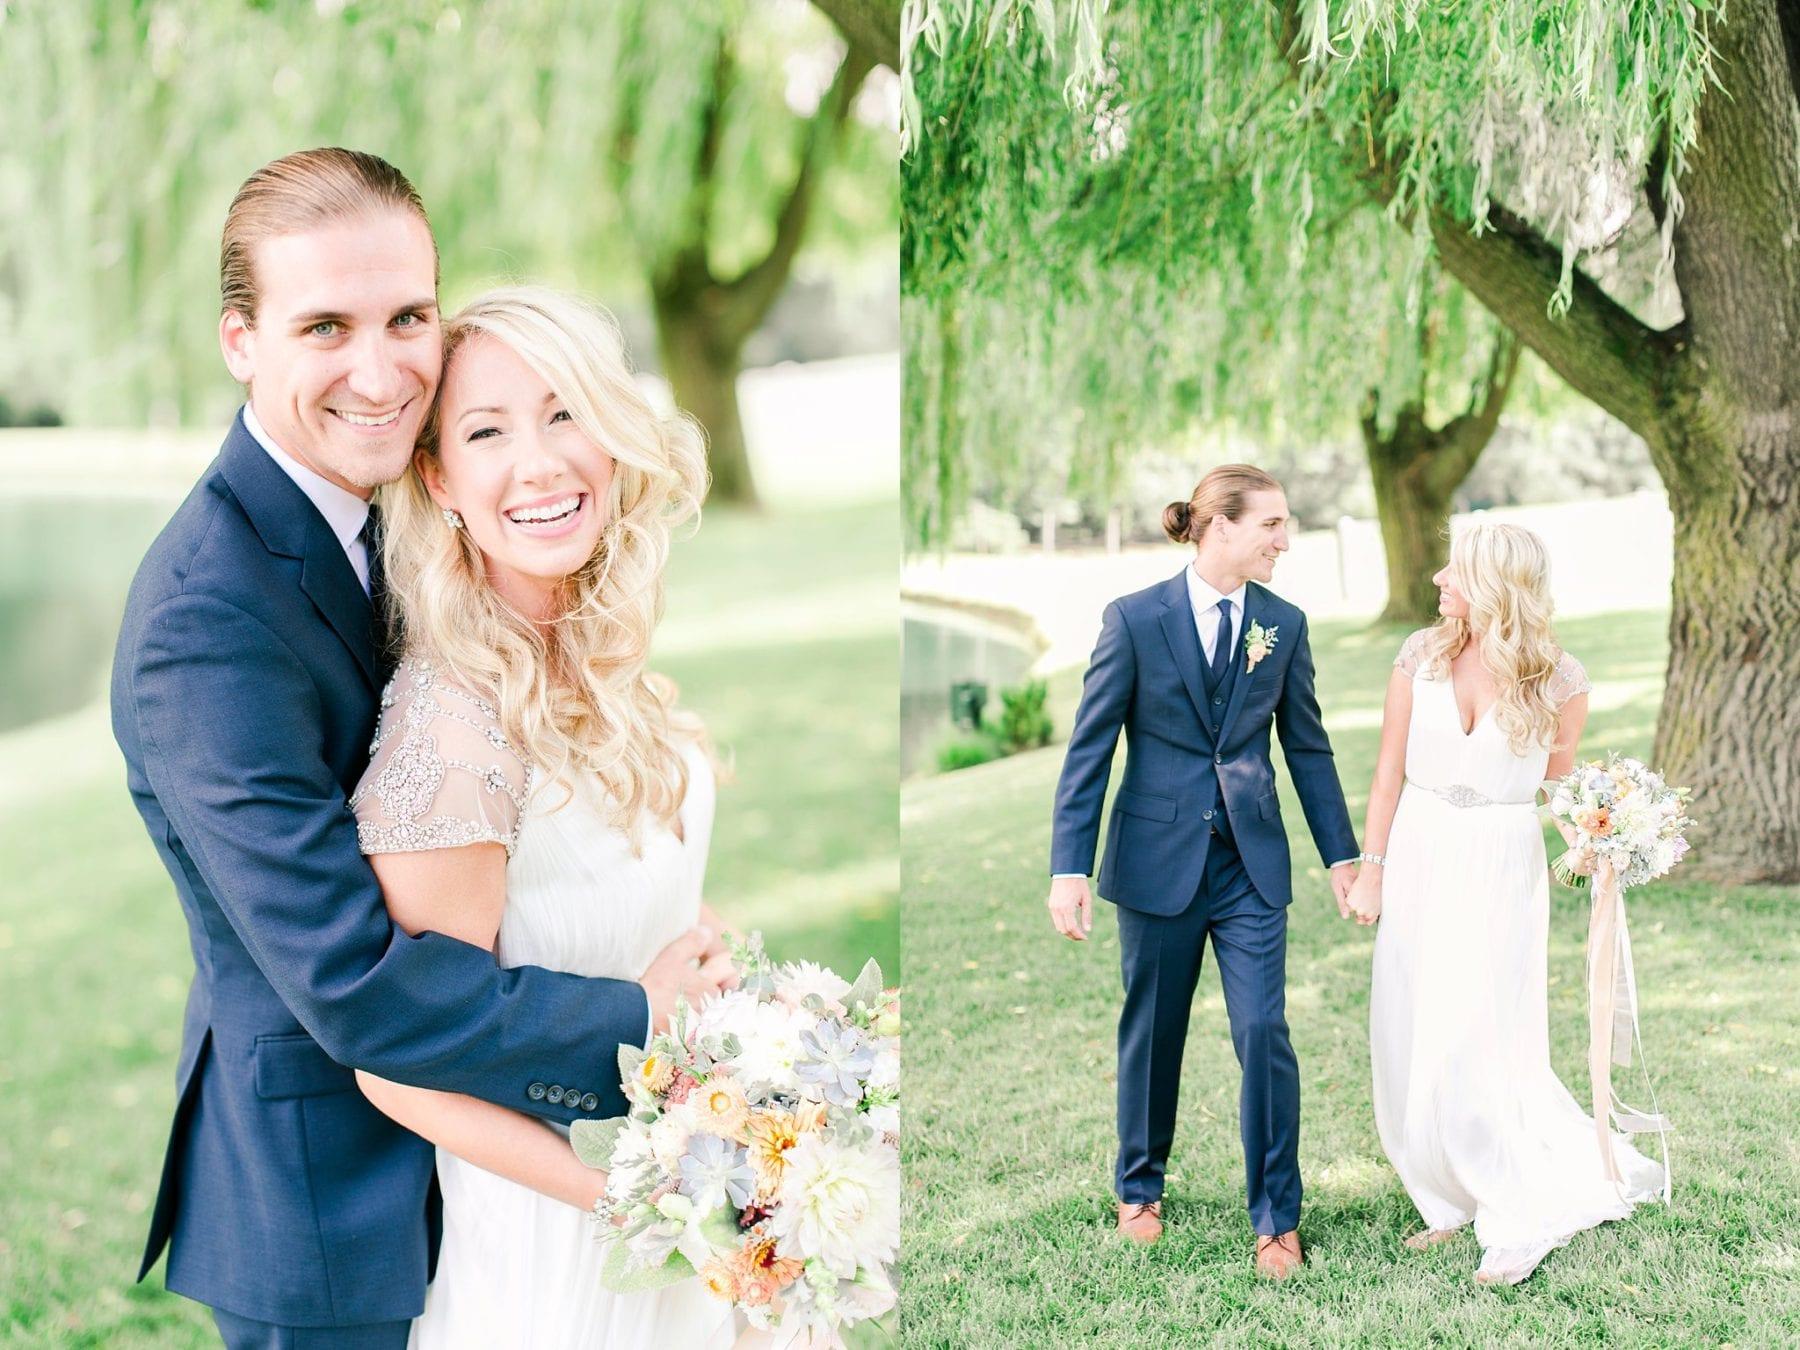 Pond View Farm Wedding Photos Maryland Wedding Photographer Kristen & Ryan Megan Kelsey Photography Blog-100.jpg